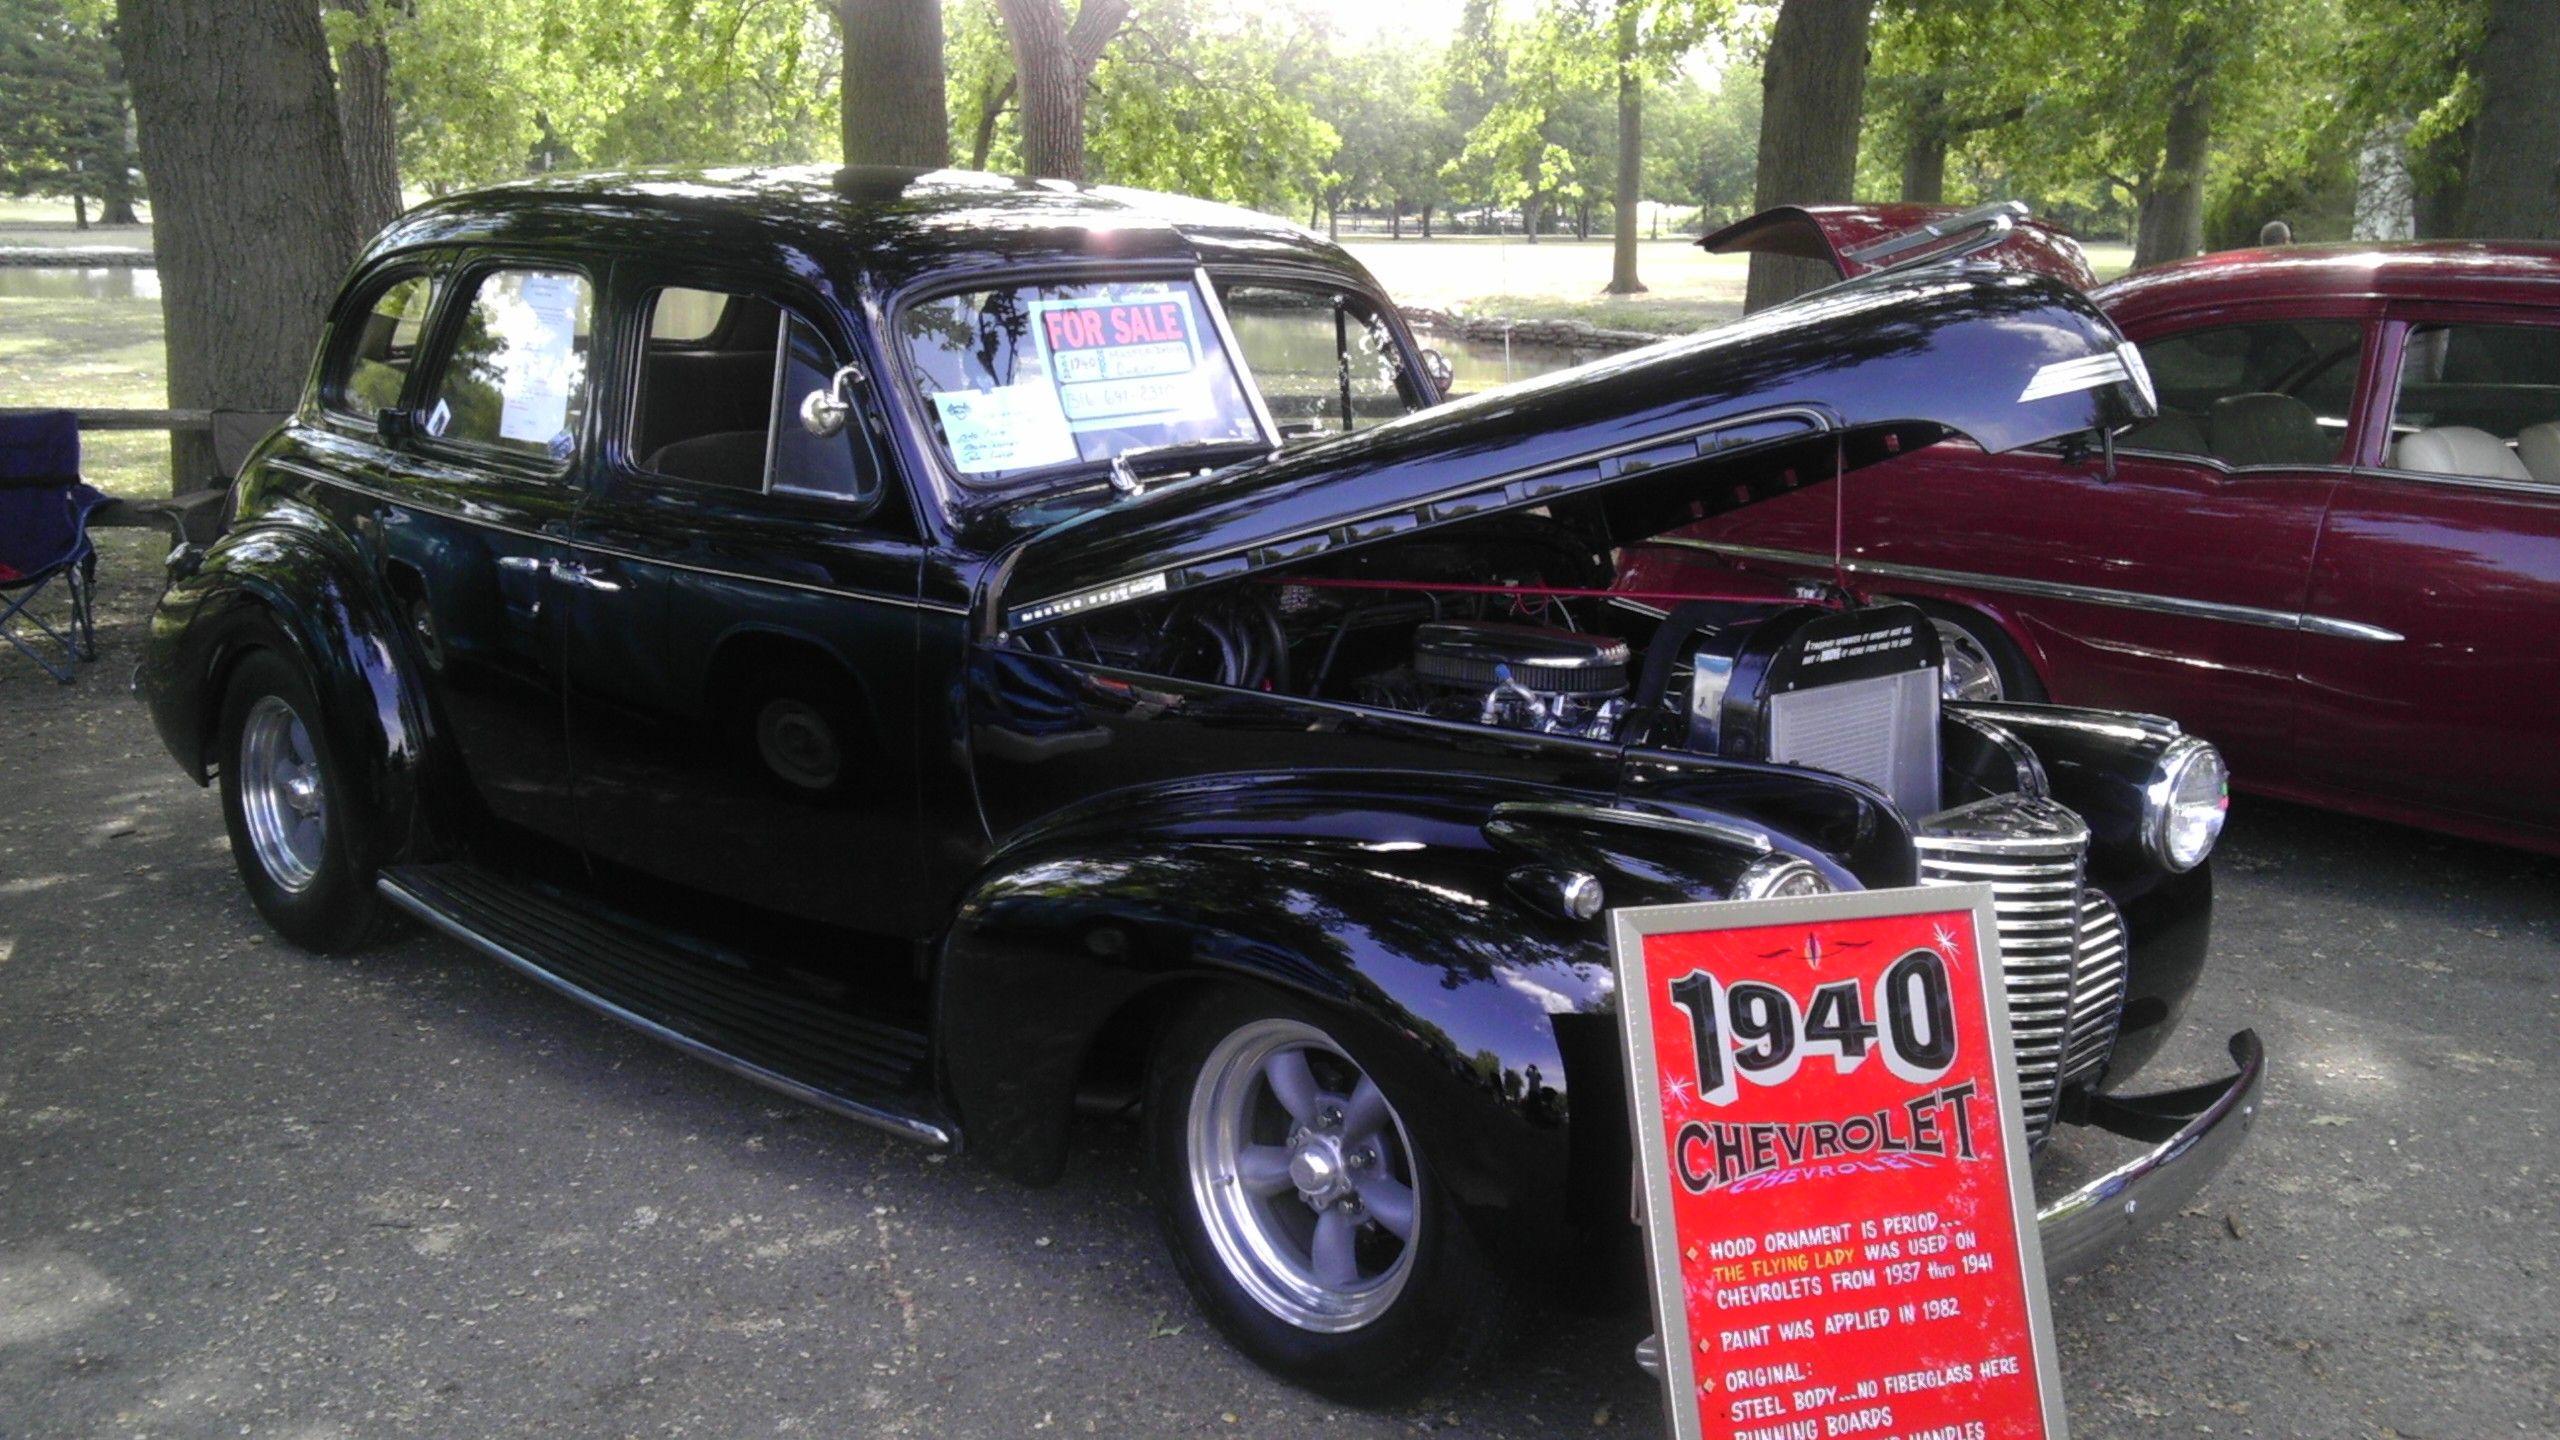 1940 Chevrolet 4 door sedan street rod for sale at: www.motorntv.com ...